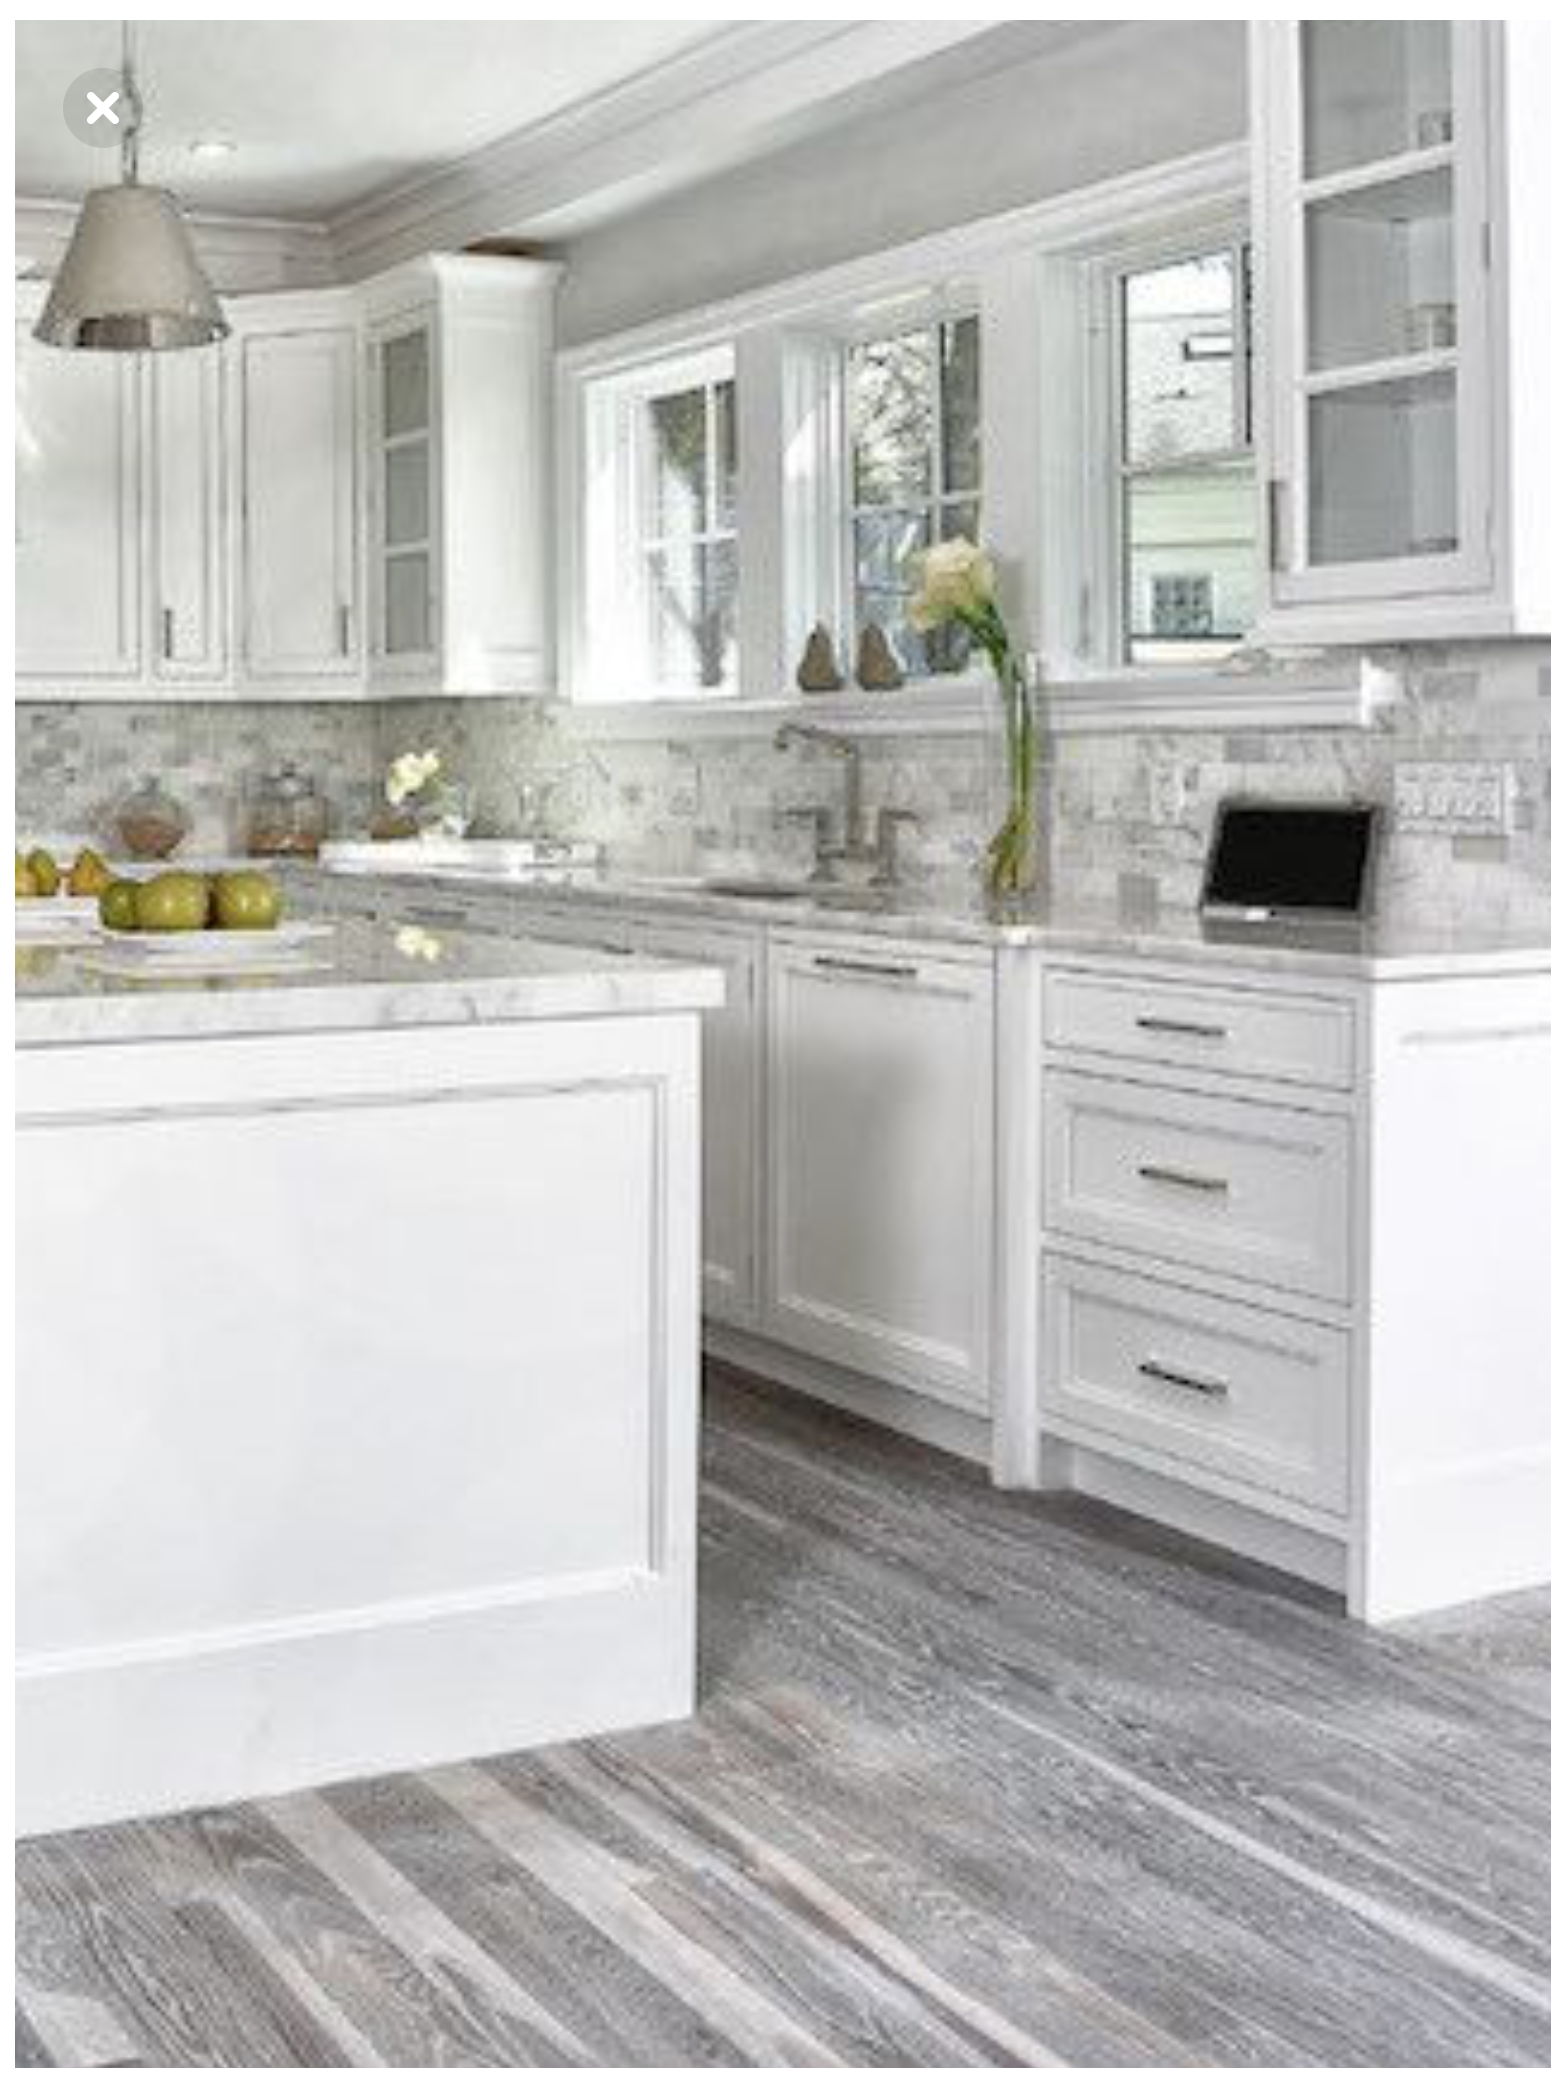 white cabinets kitchen grey floors ...